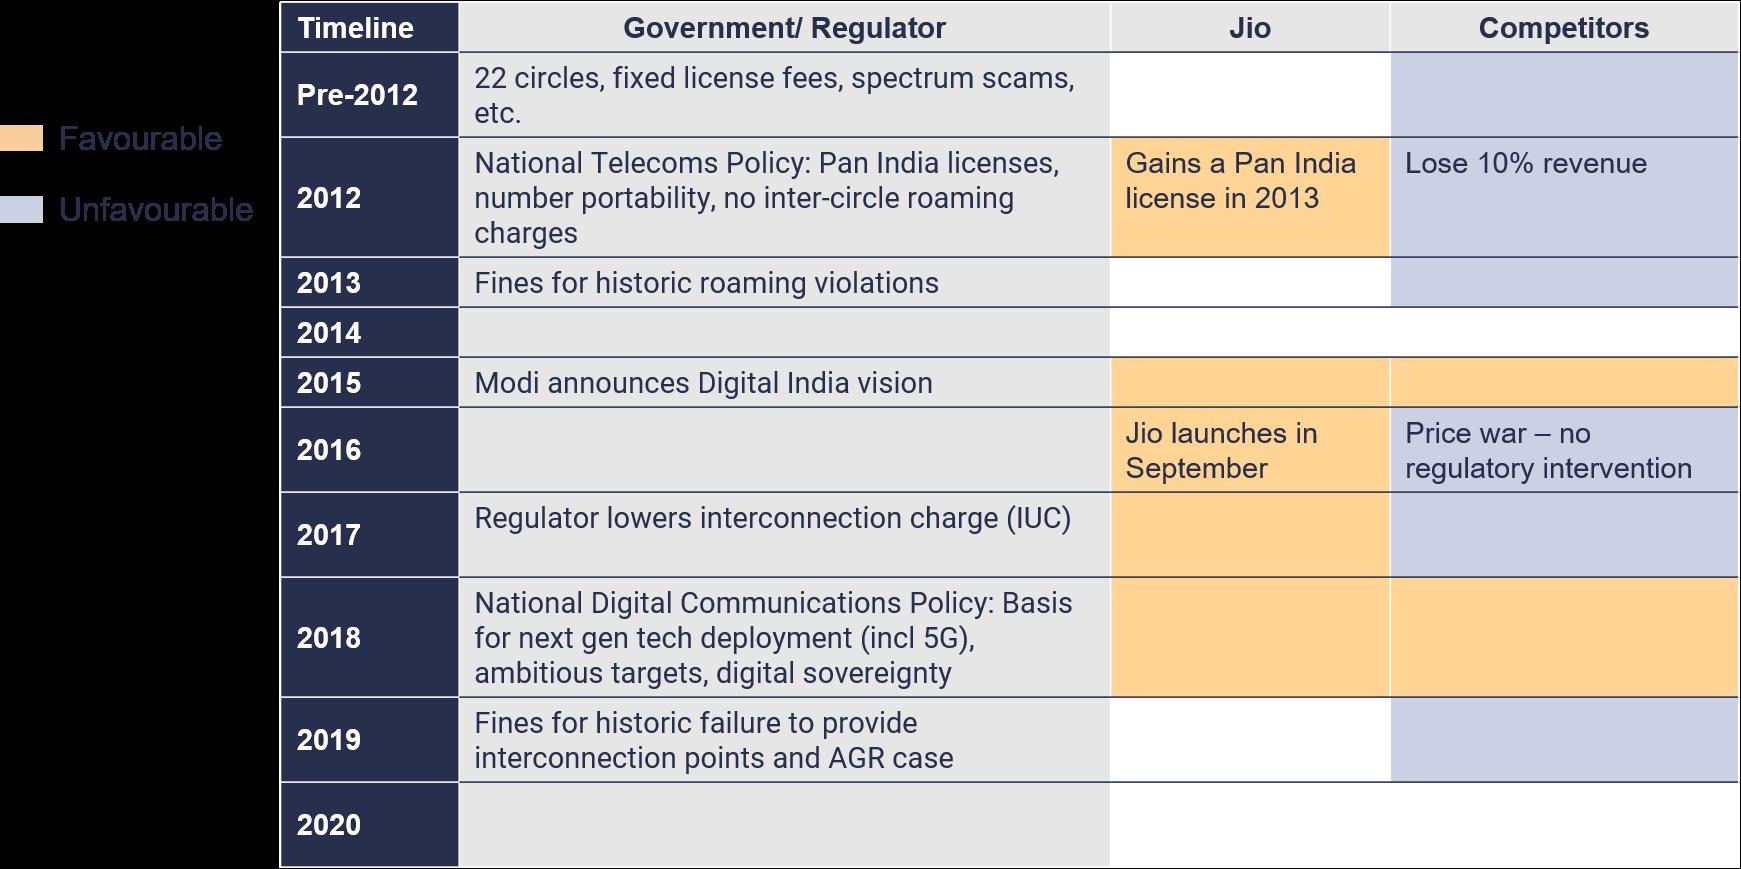 Jio solves indias problems